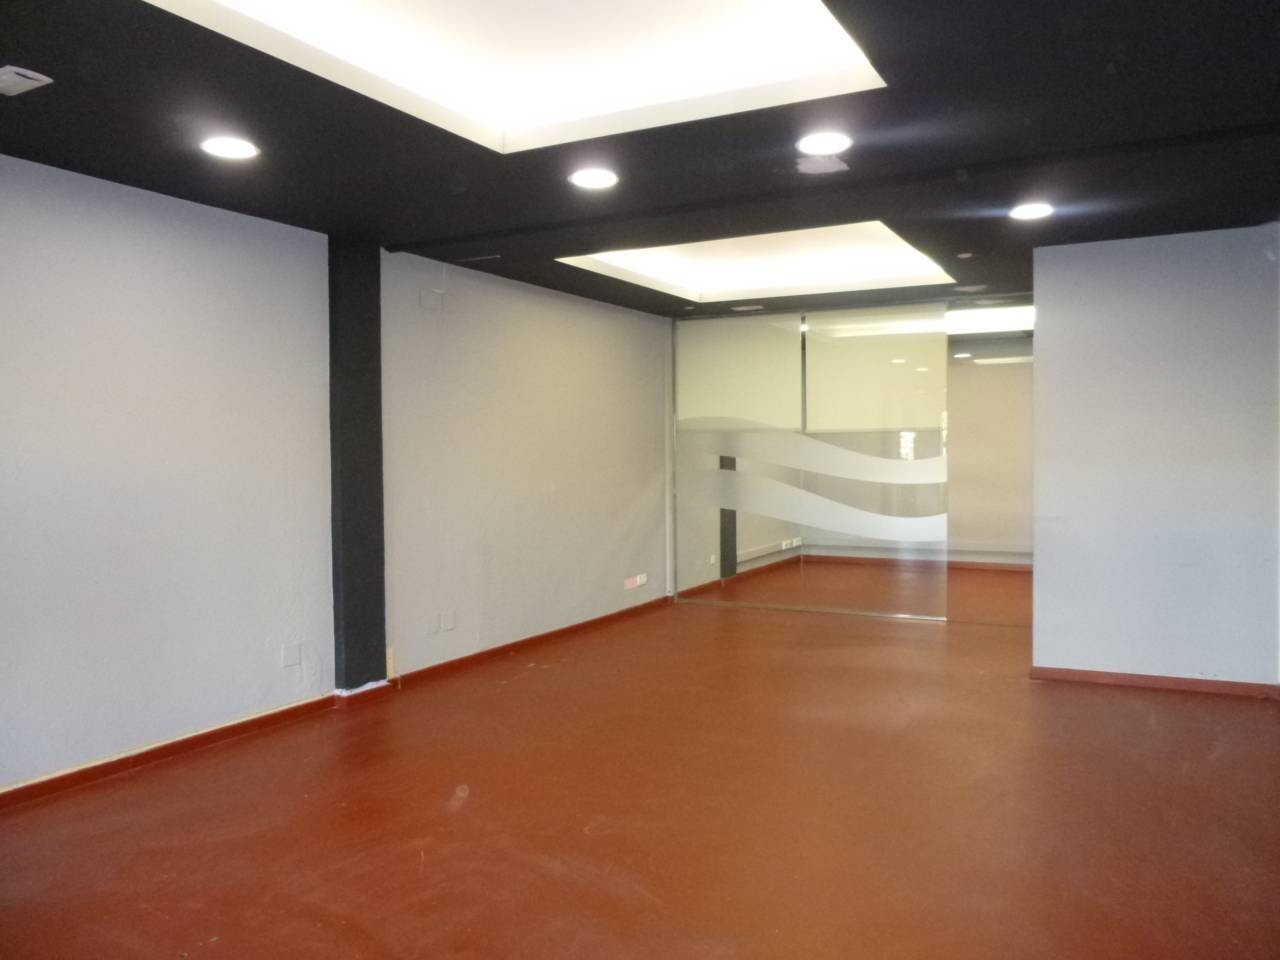 087260 - Commercial premises for rent in Empuriabrava